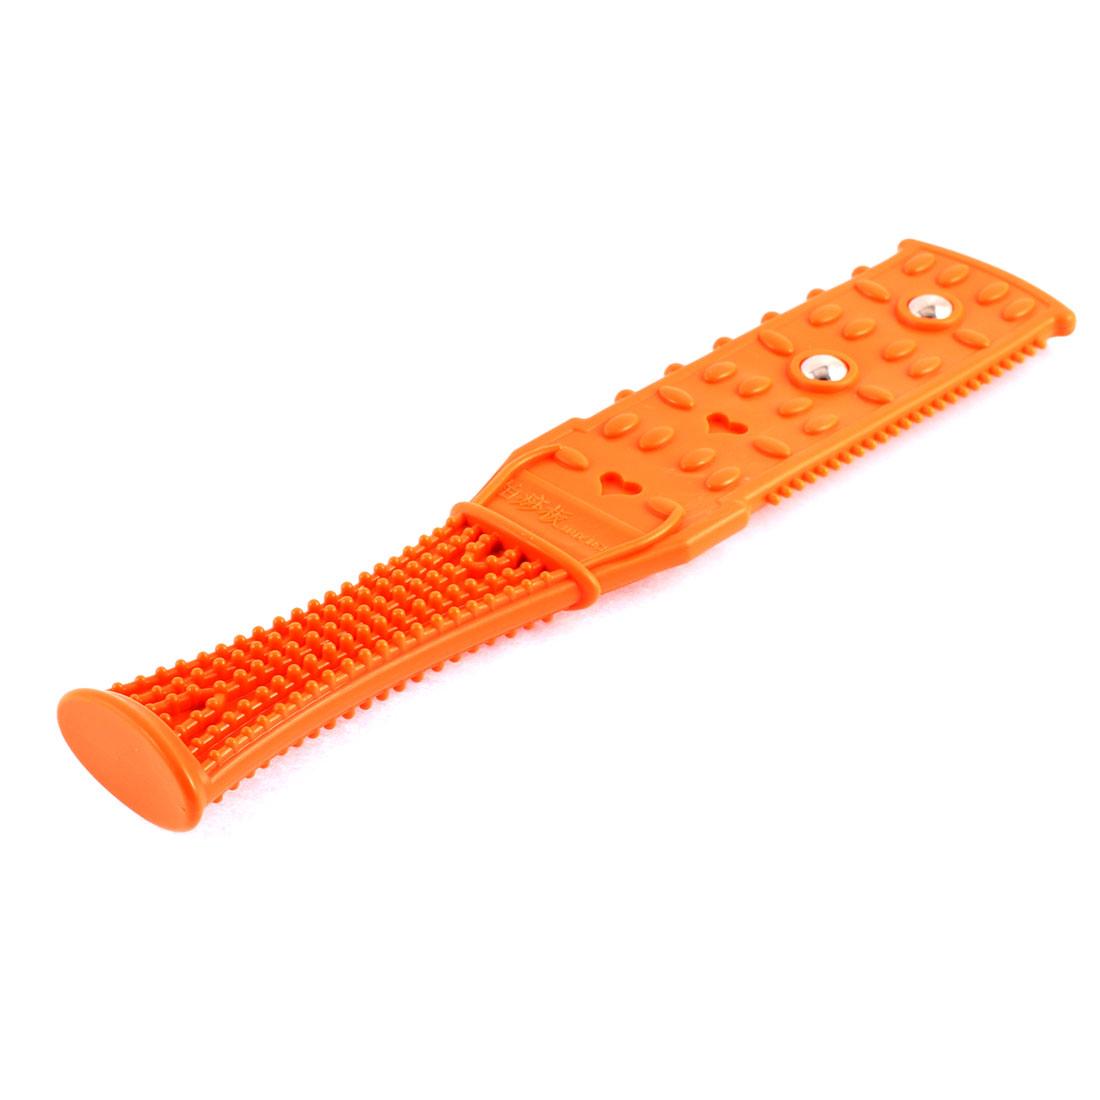 Regimen Fitness Body Neck Leg Fever Massage Pat Beat Plate Stick Orange